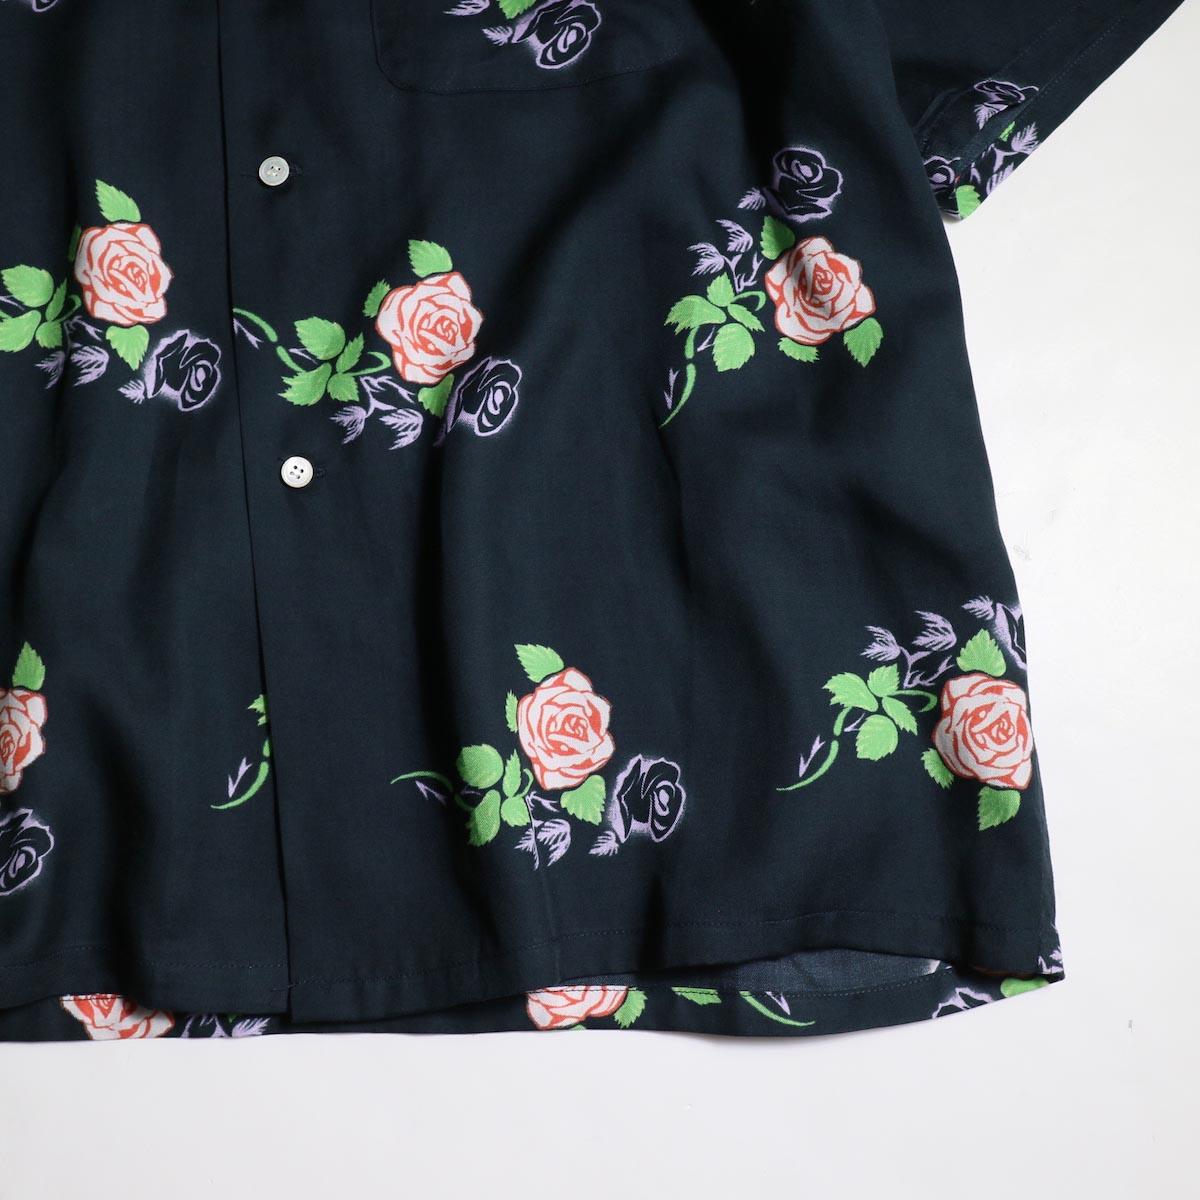 F-LAGSTUF-F  / ROSE S/S SHIRTS 裾